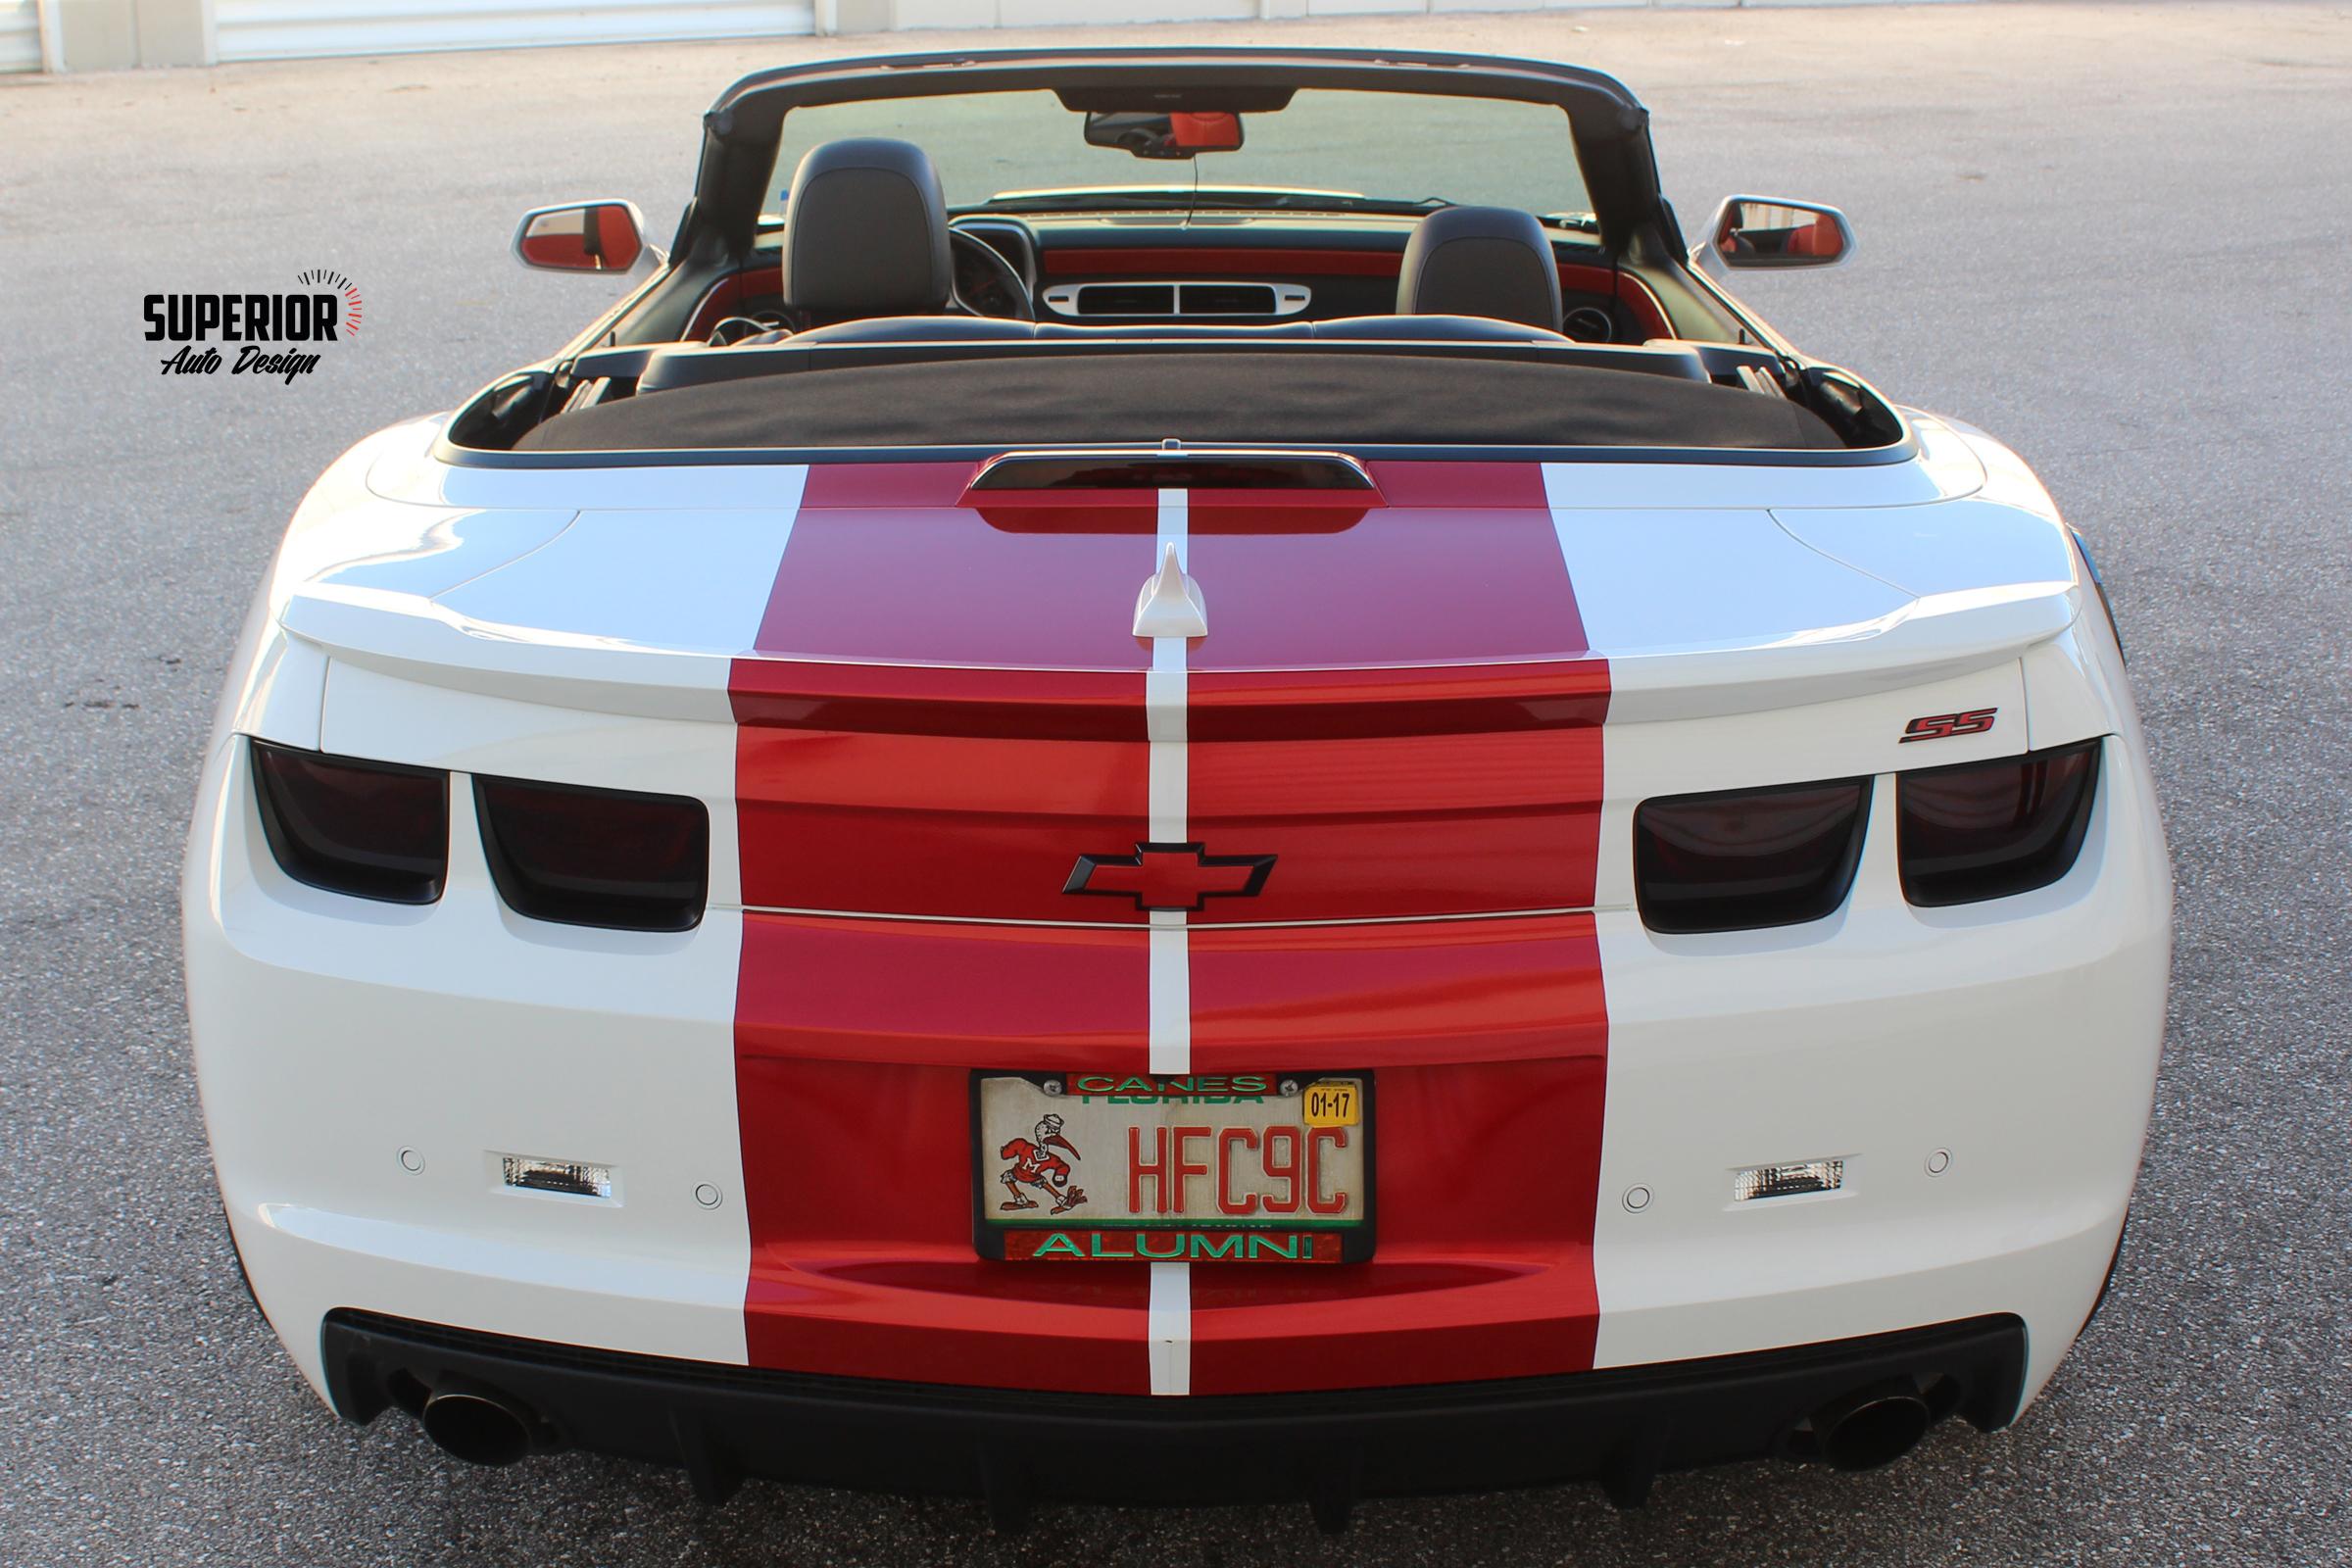 camaro-ss-racing-stripes-superior-auto-design-7